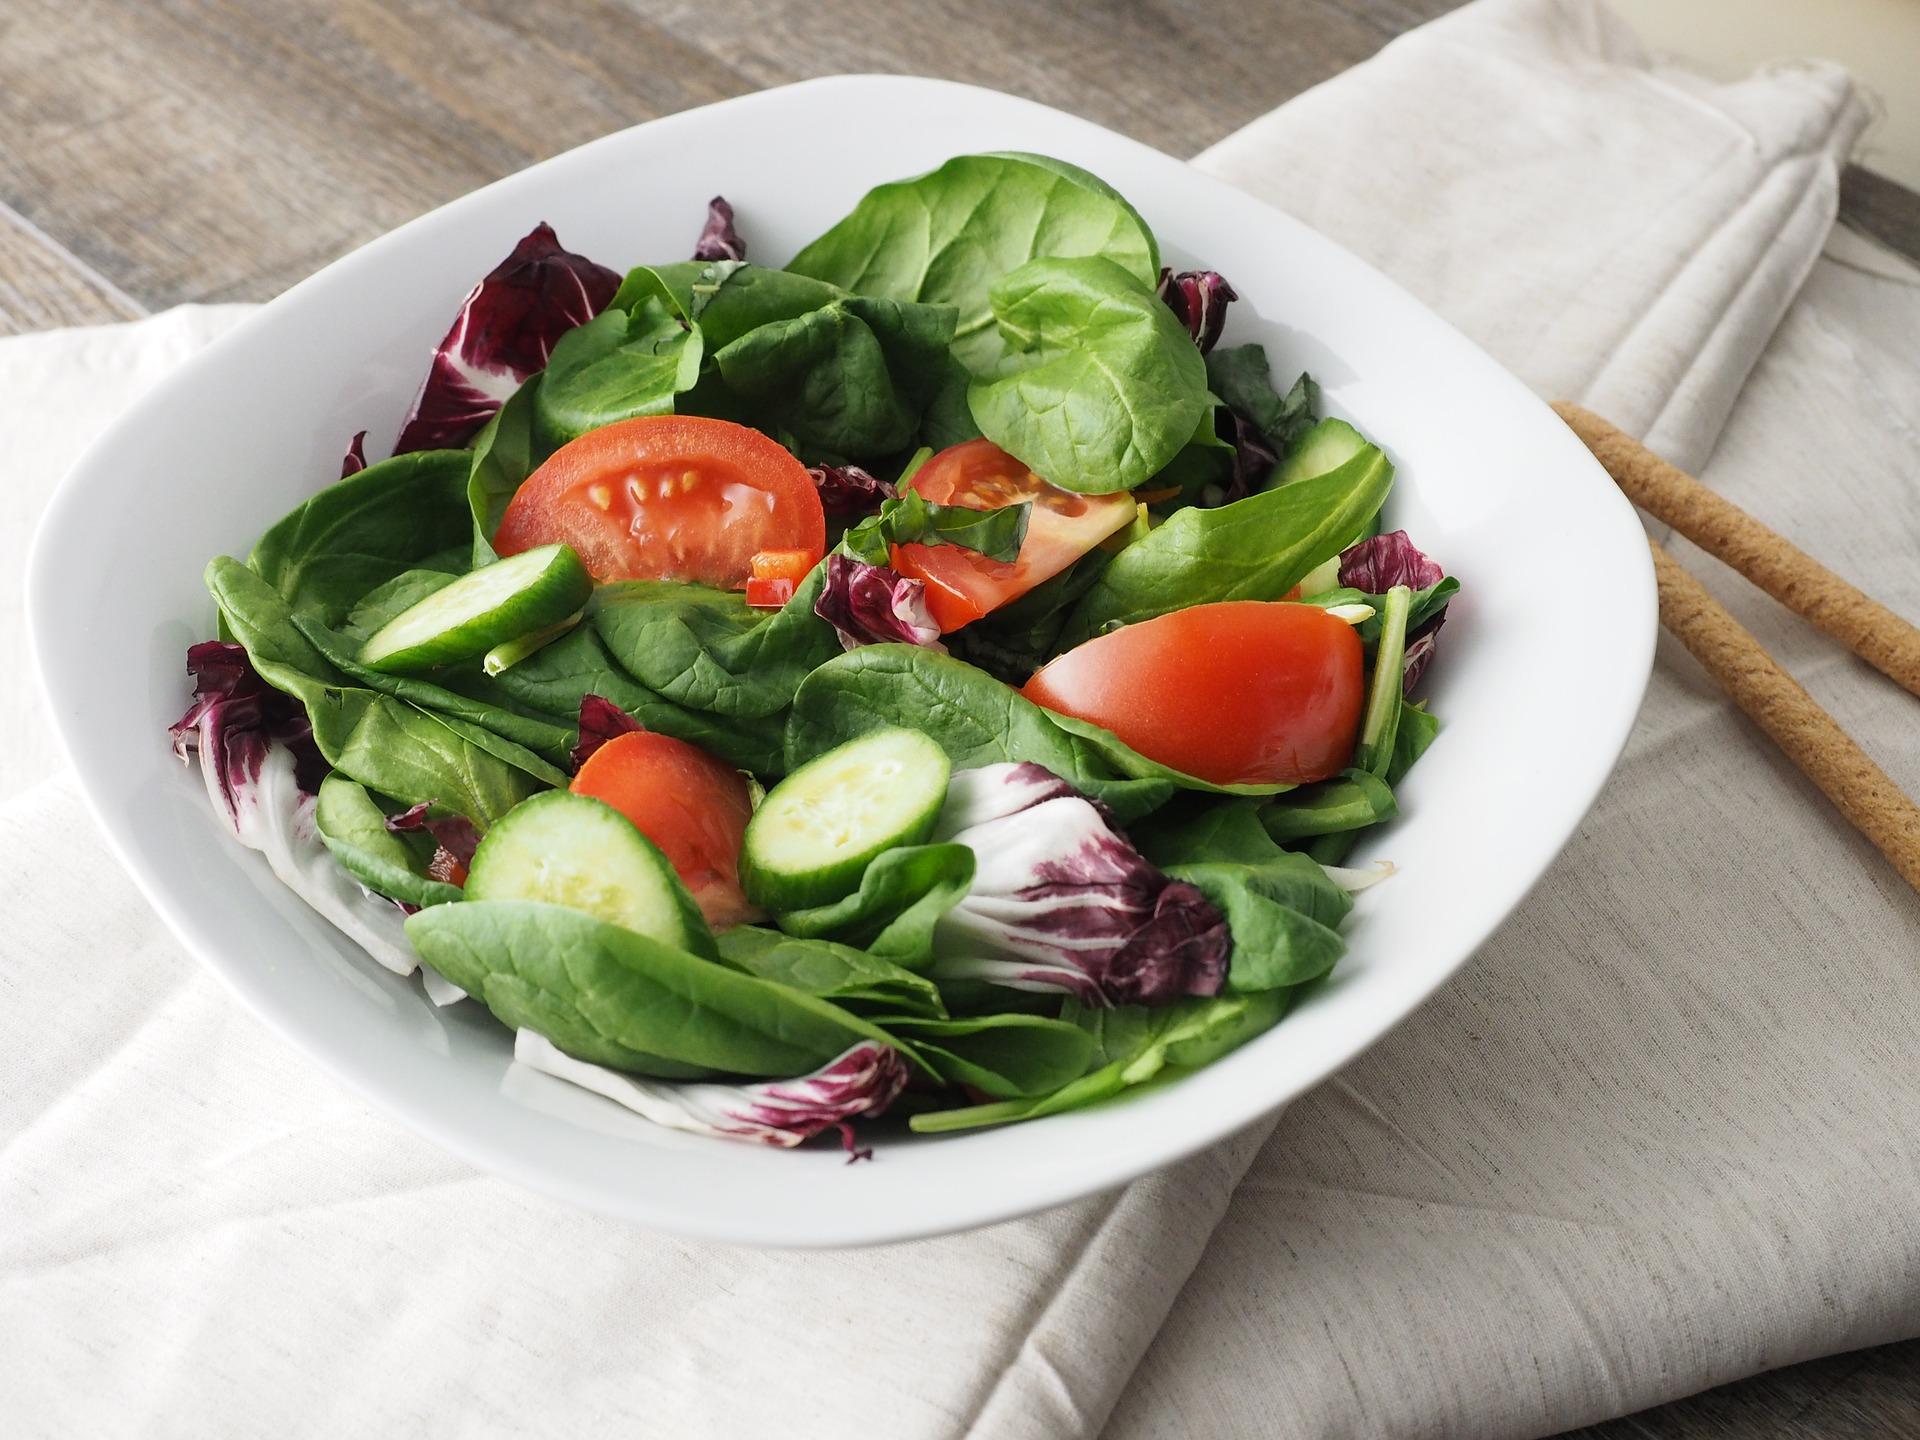 Salad dressings in my fridge (+ recipes)